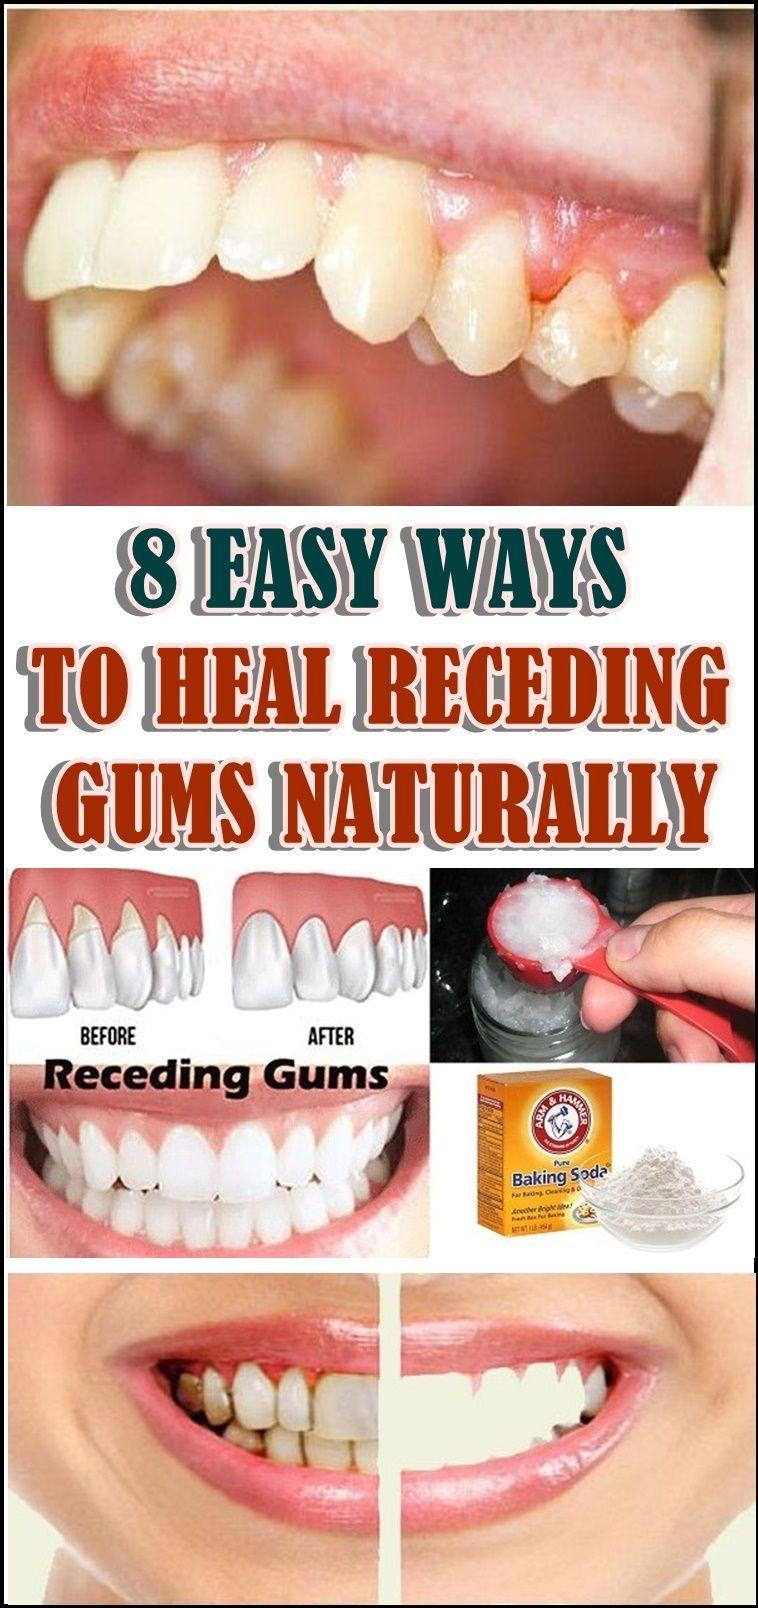 How To Reverse Periodontitis Heal Receding Gums In 2020 Receding Gums Gum Health Gum Care